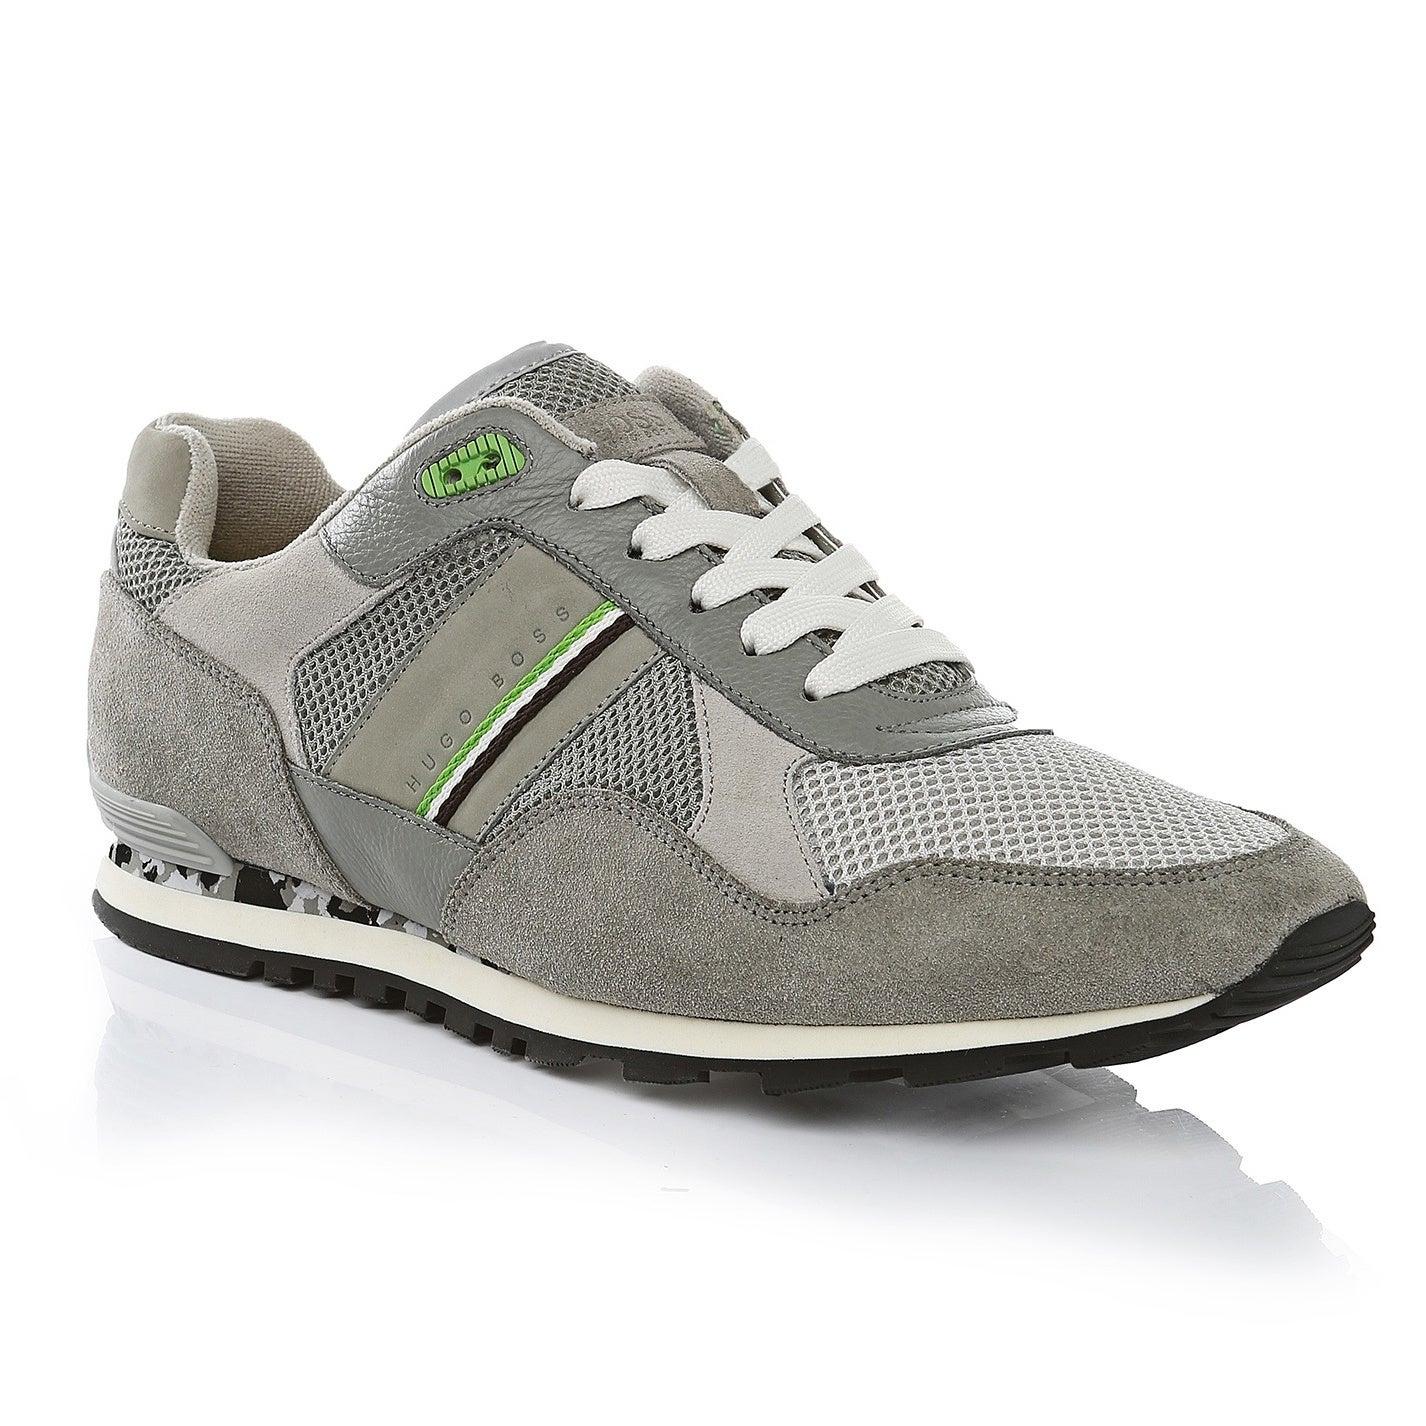 Shop Hugo Boss Grey Runcool Sneakers